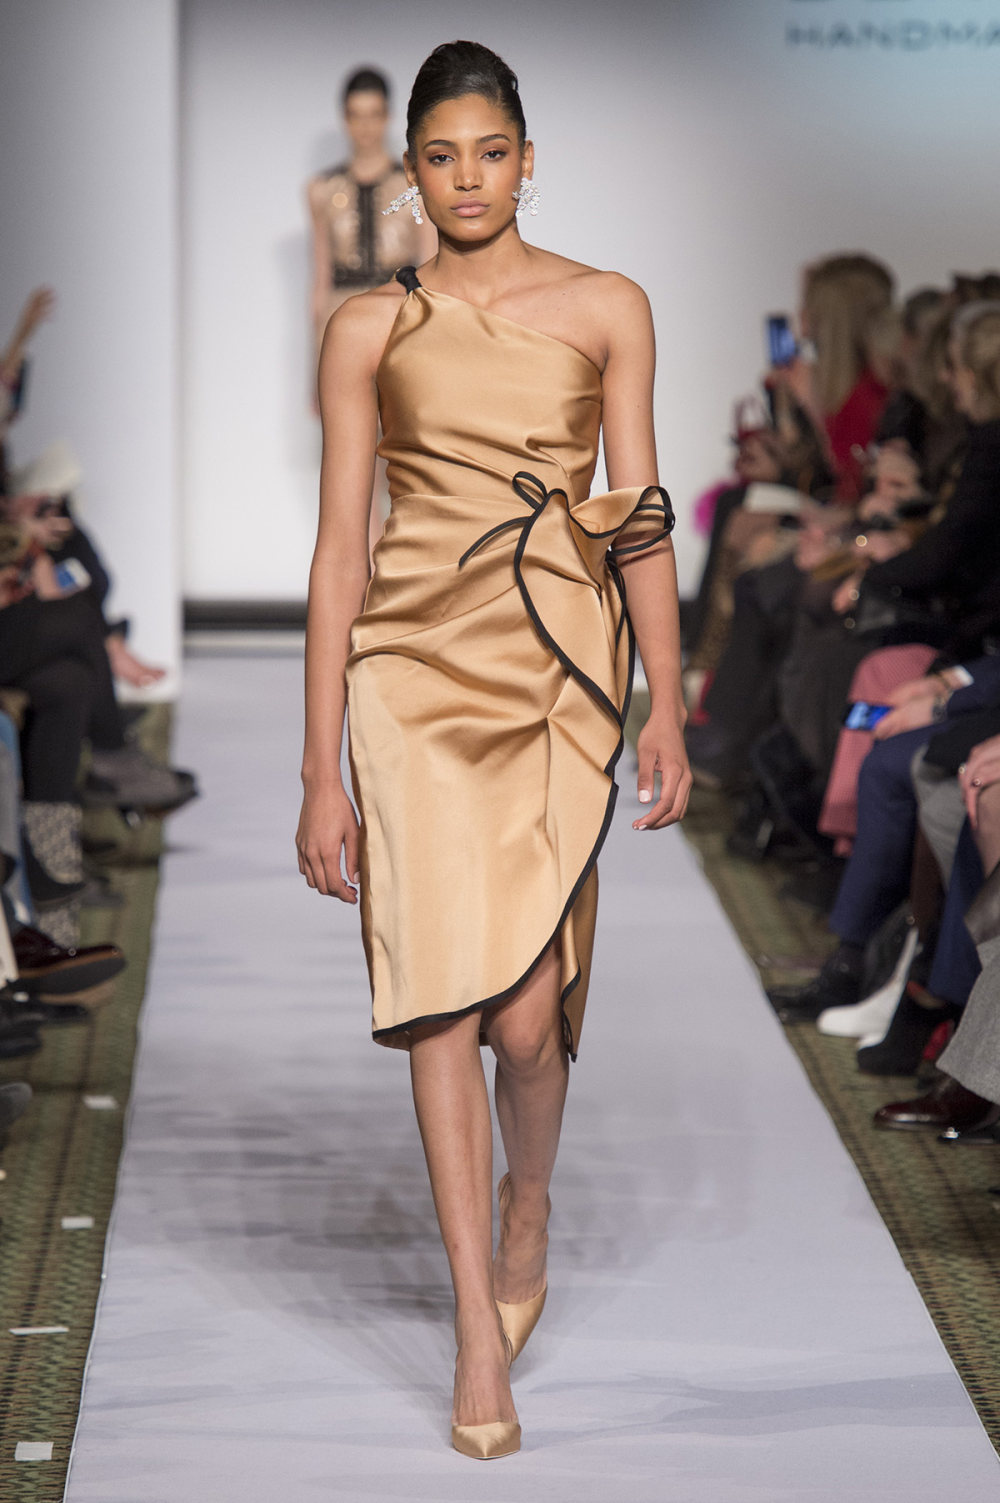 Carolina Herrera时装系列用鲜艳的颜色充满智能的黑白色调-41.jpg